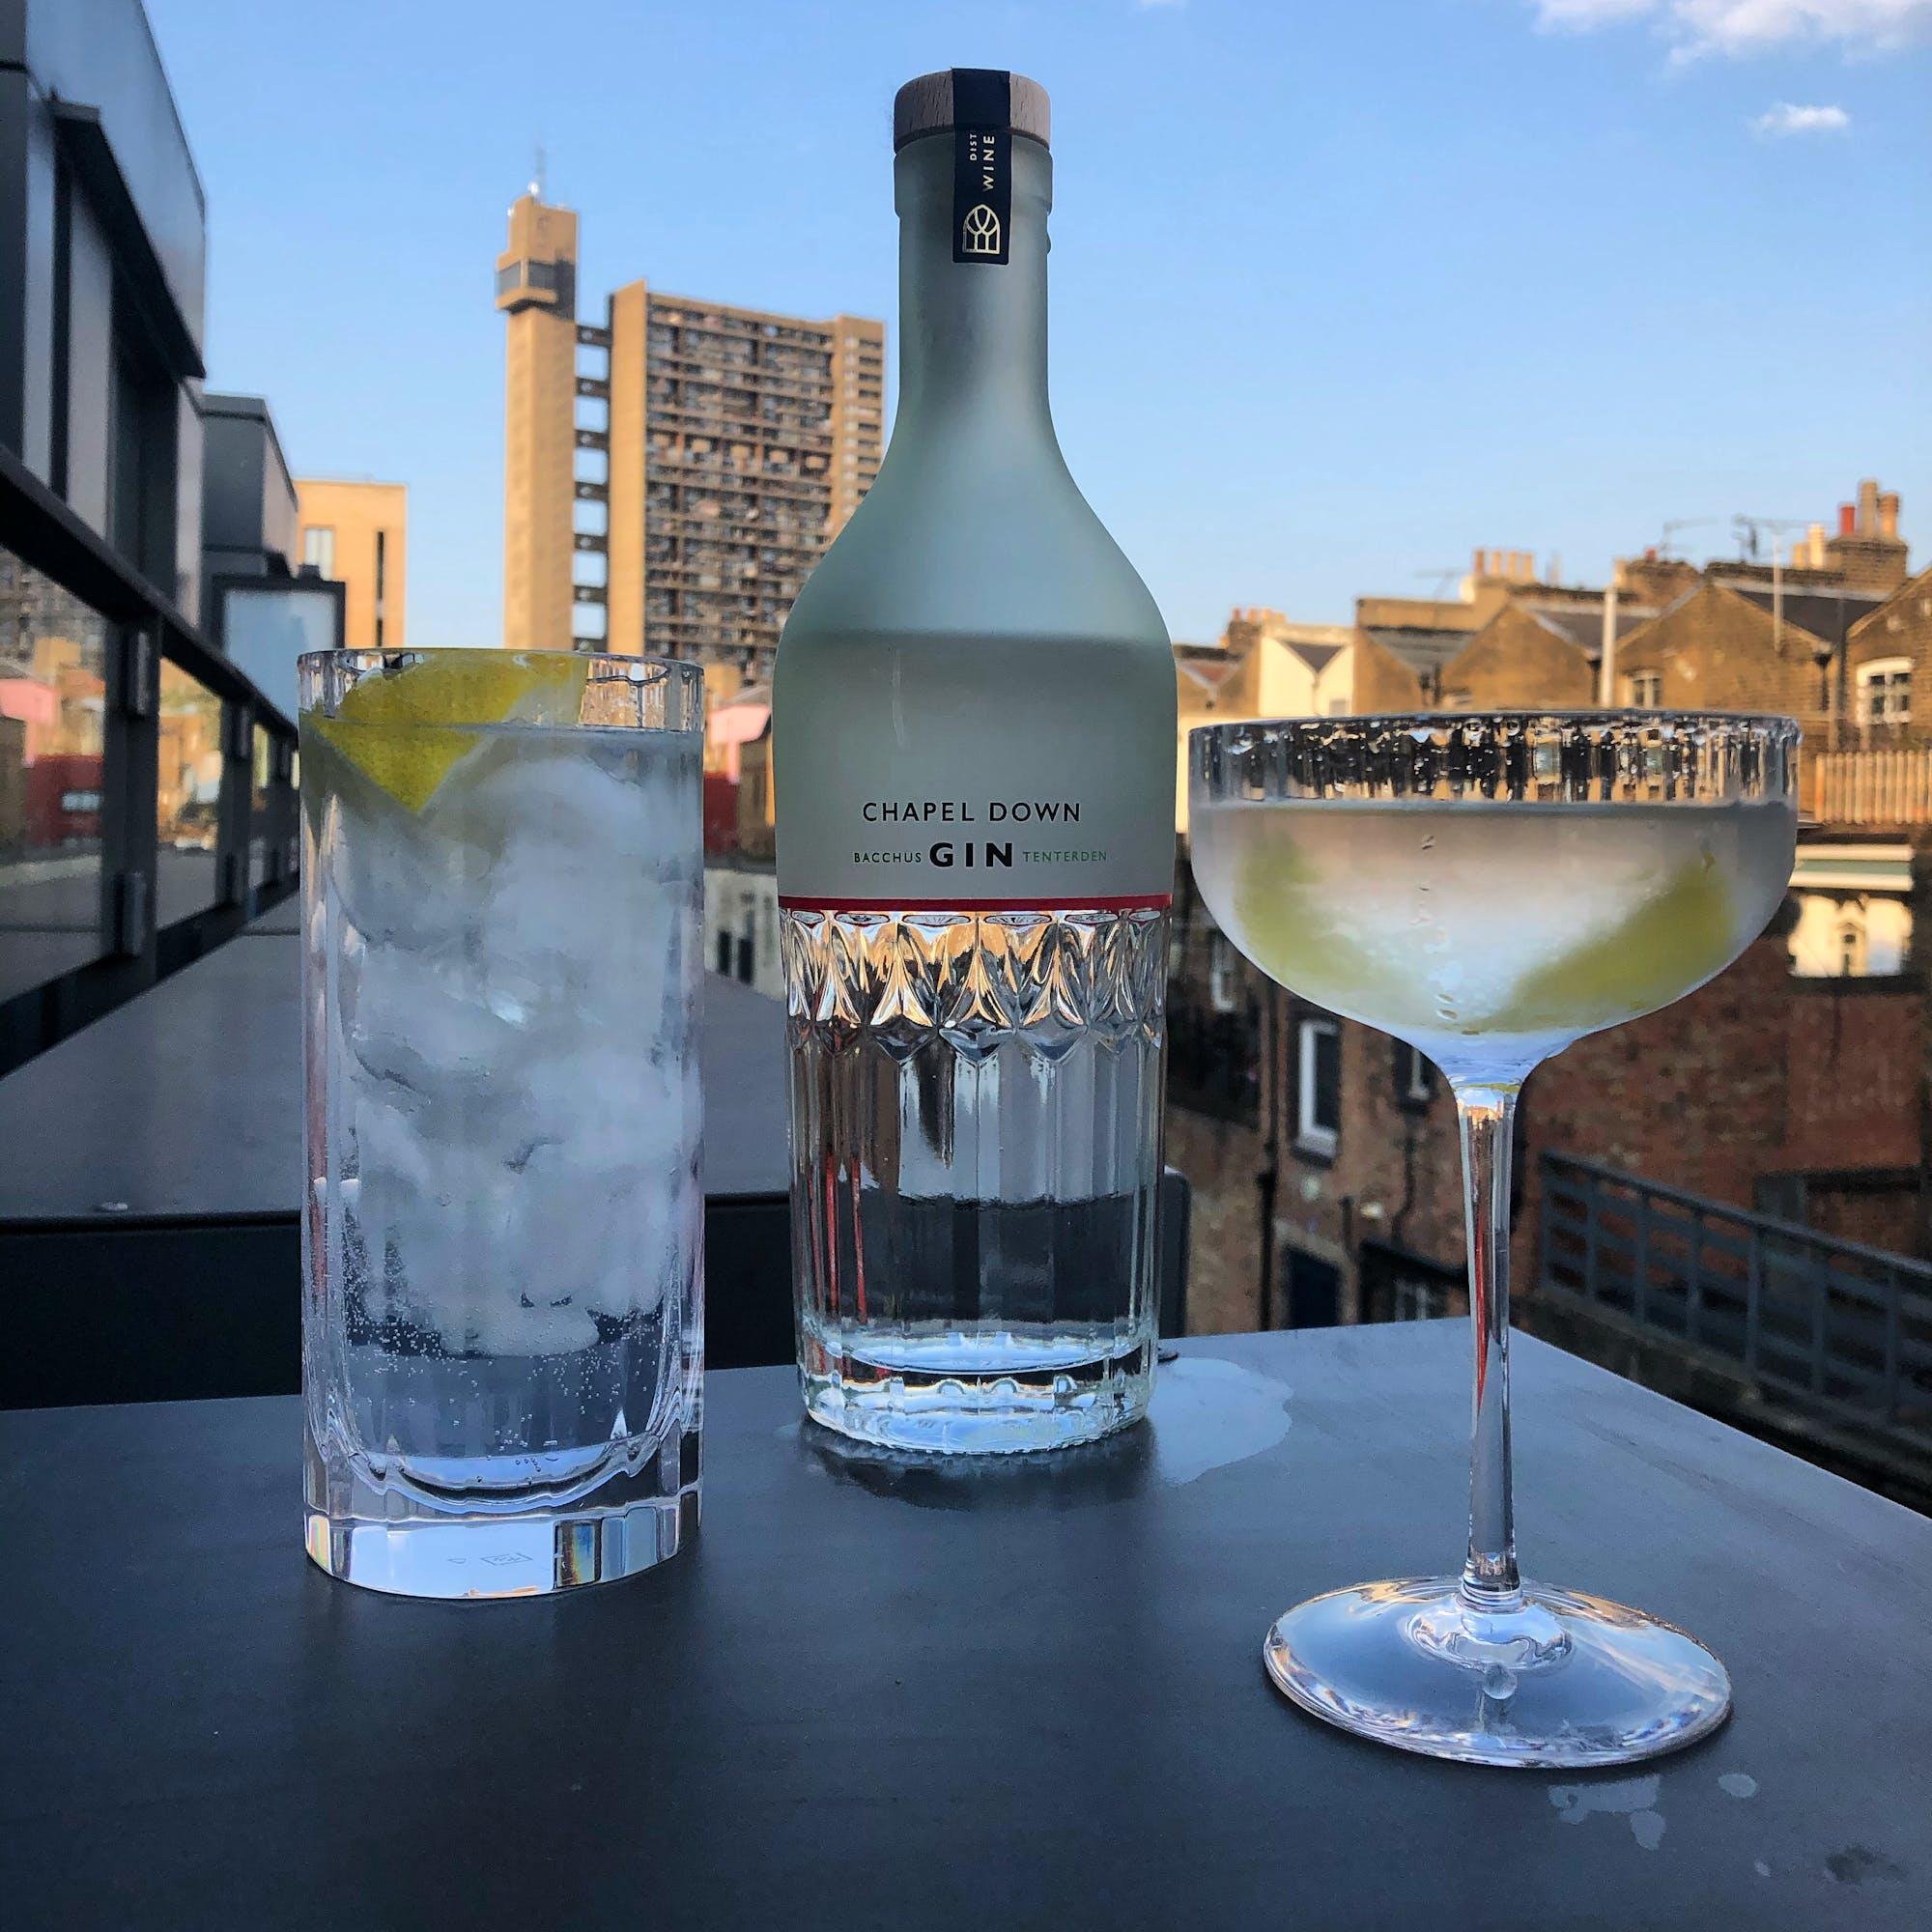 The Walpole Daily Practice  Richard Brendon's cocktail connoisseurship